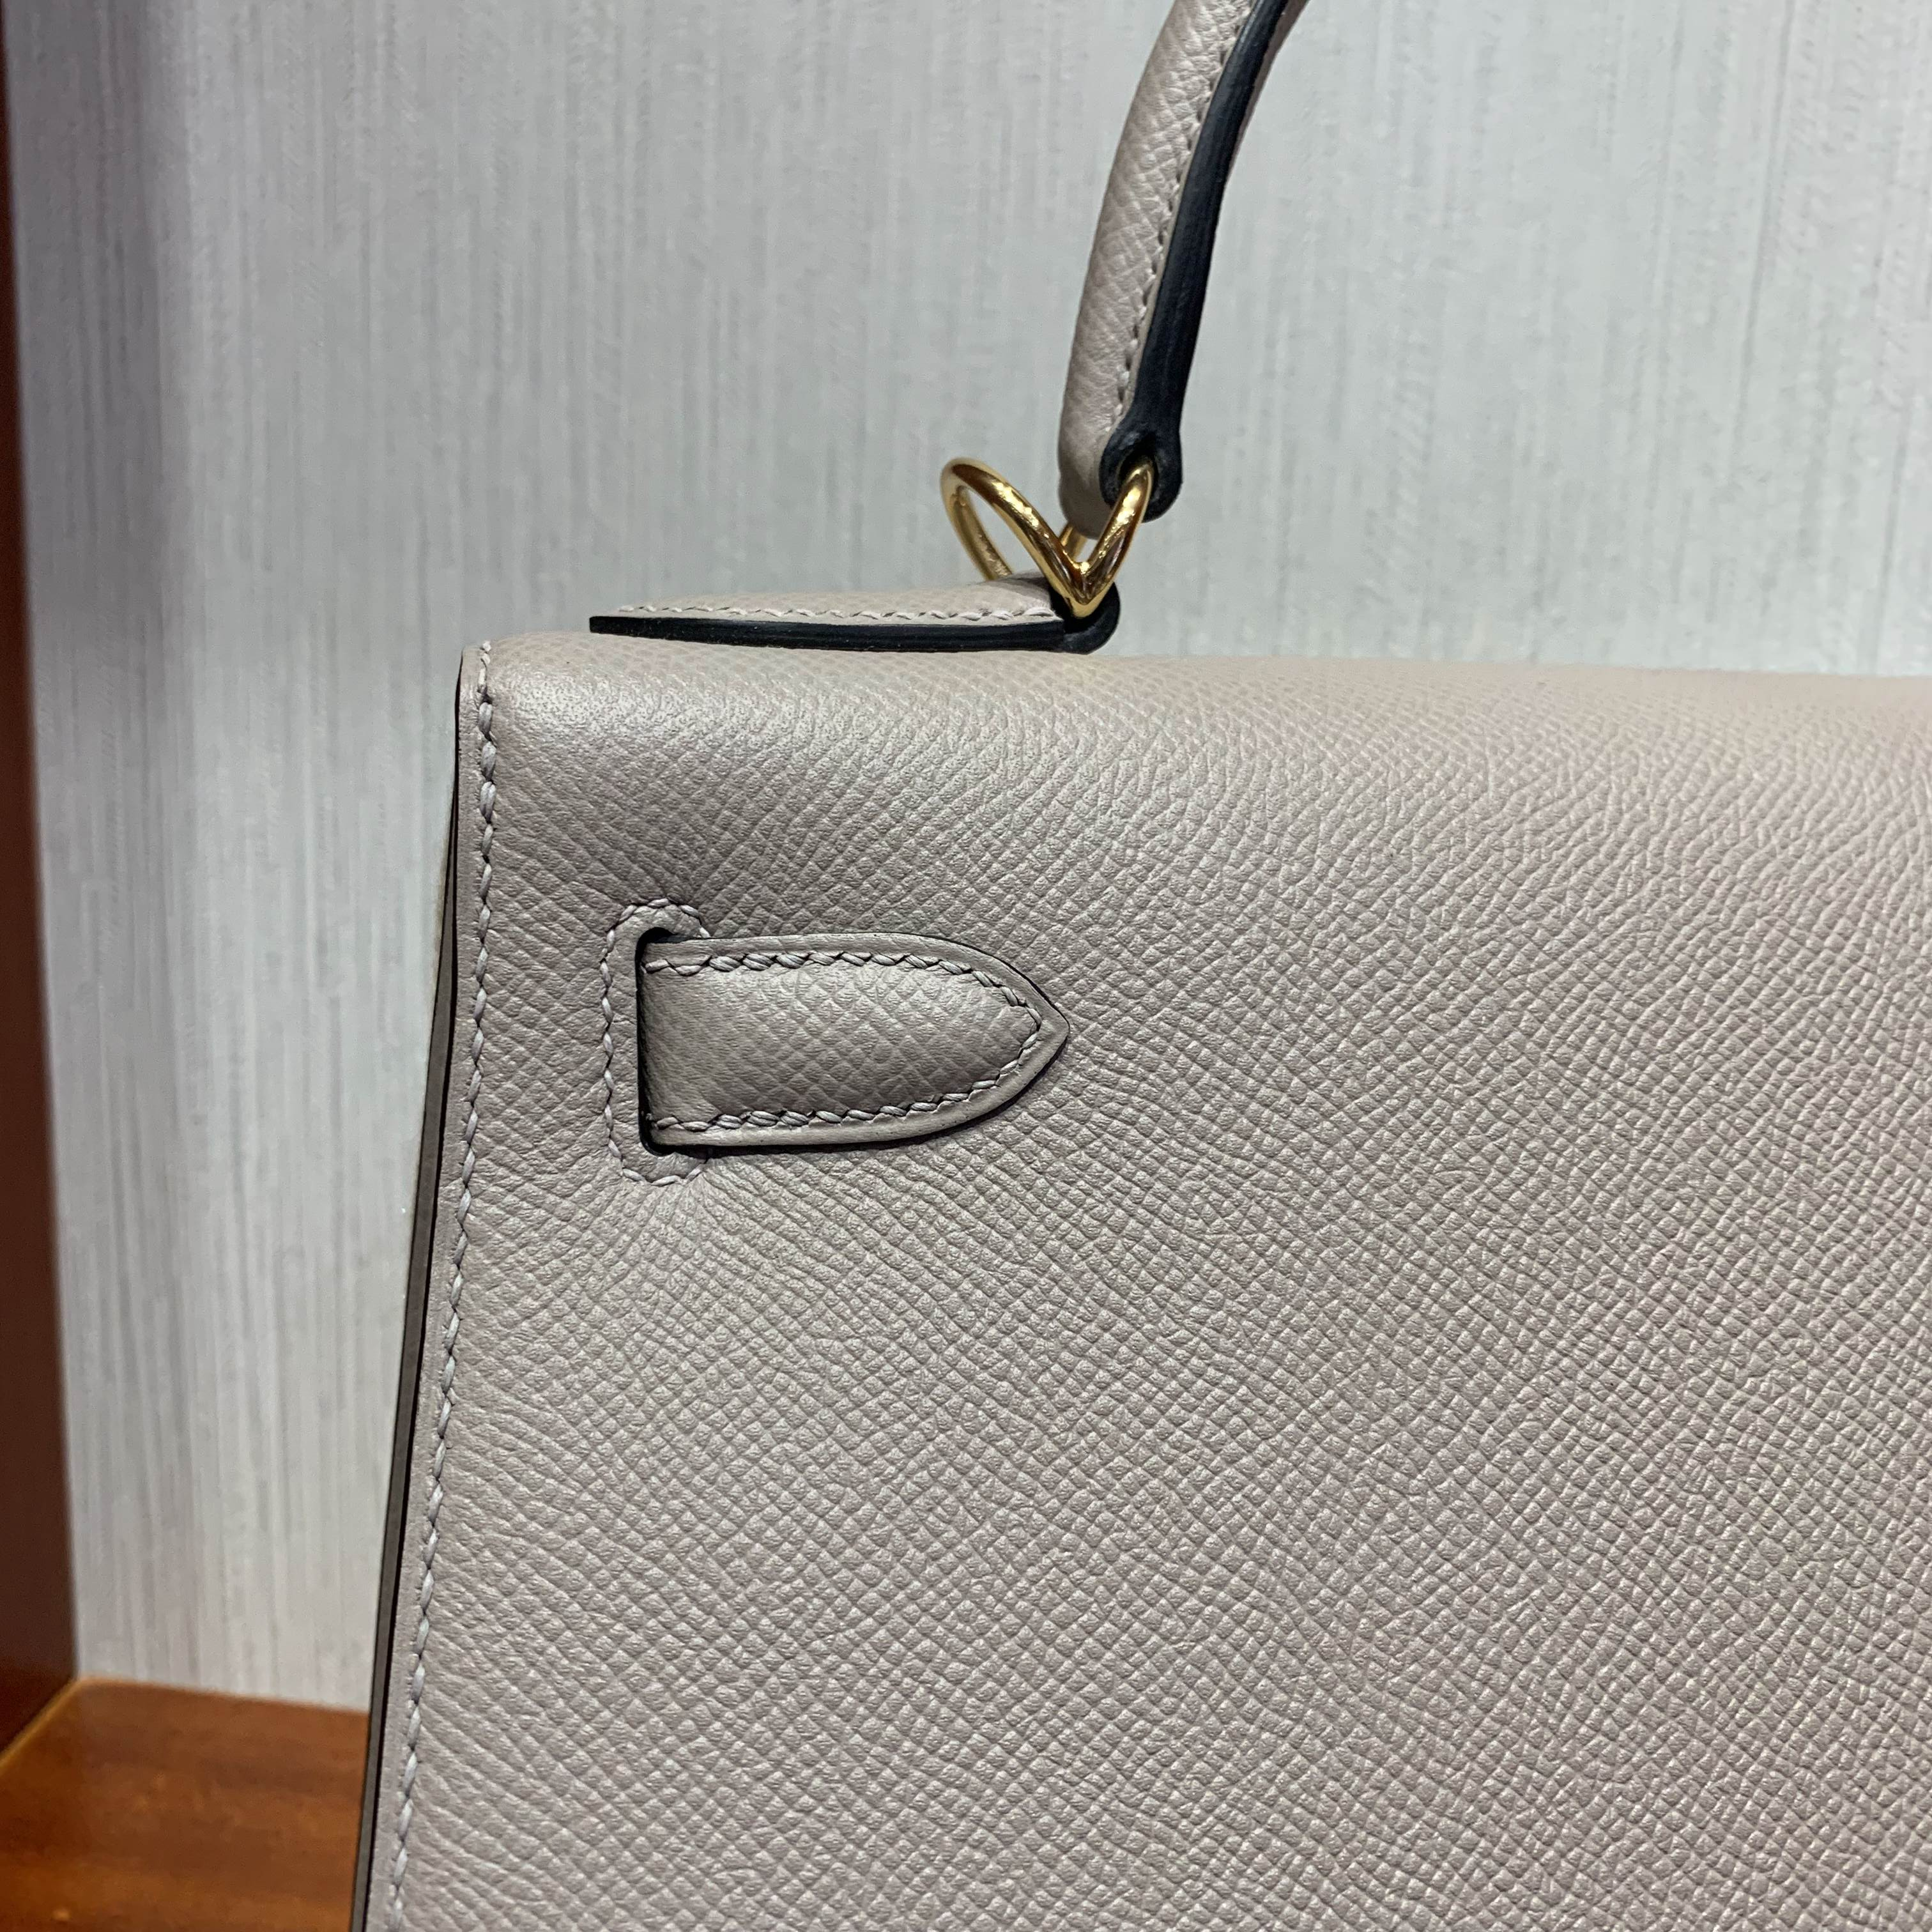 愛馬仕包包價格 Hermes Kelly 28cm bag M8 Griss Asphalte瀝青灰 Epsom